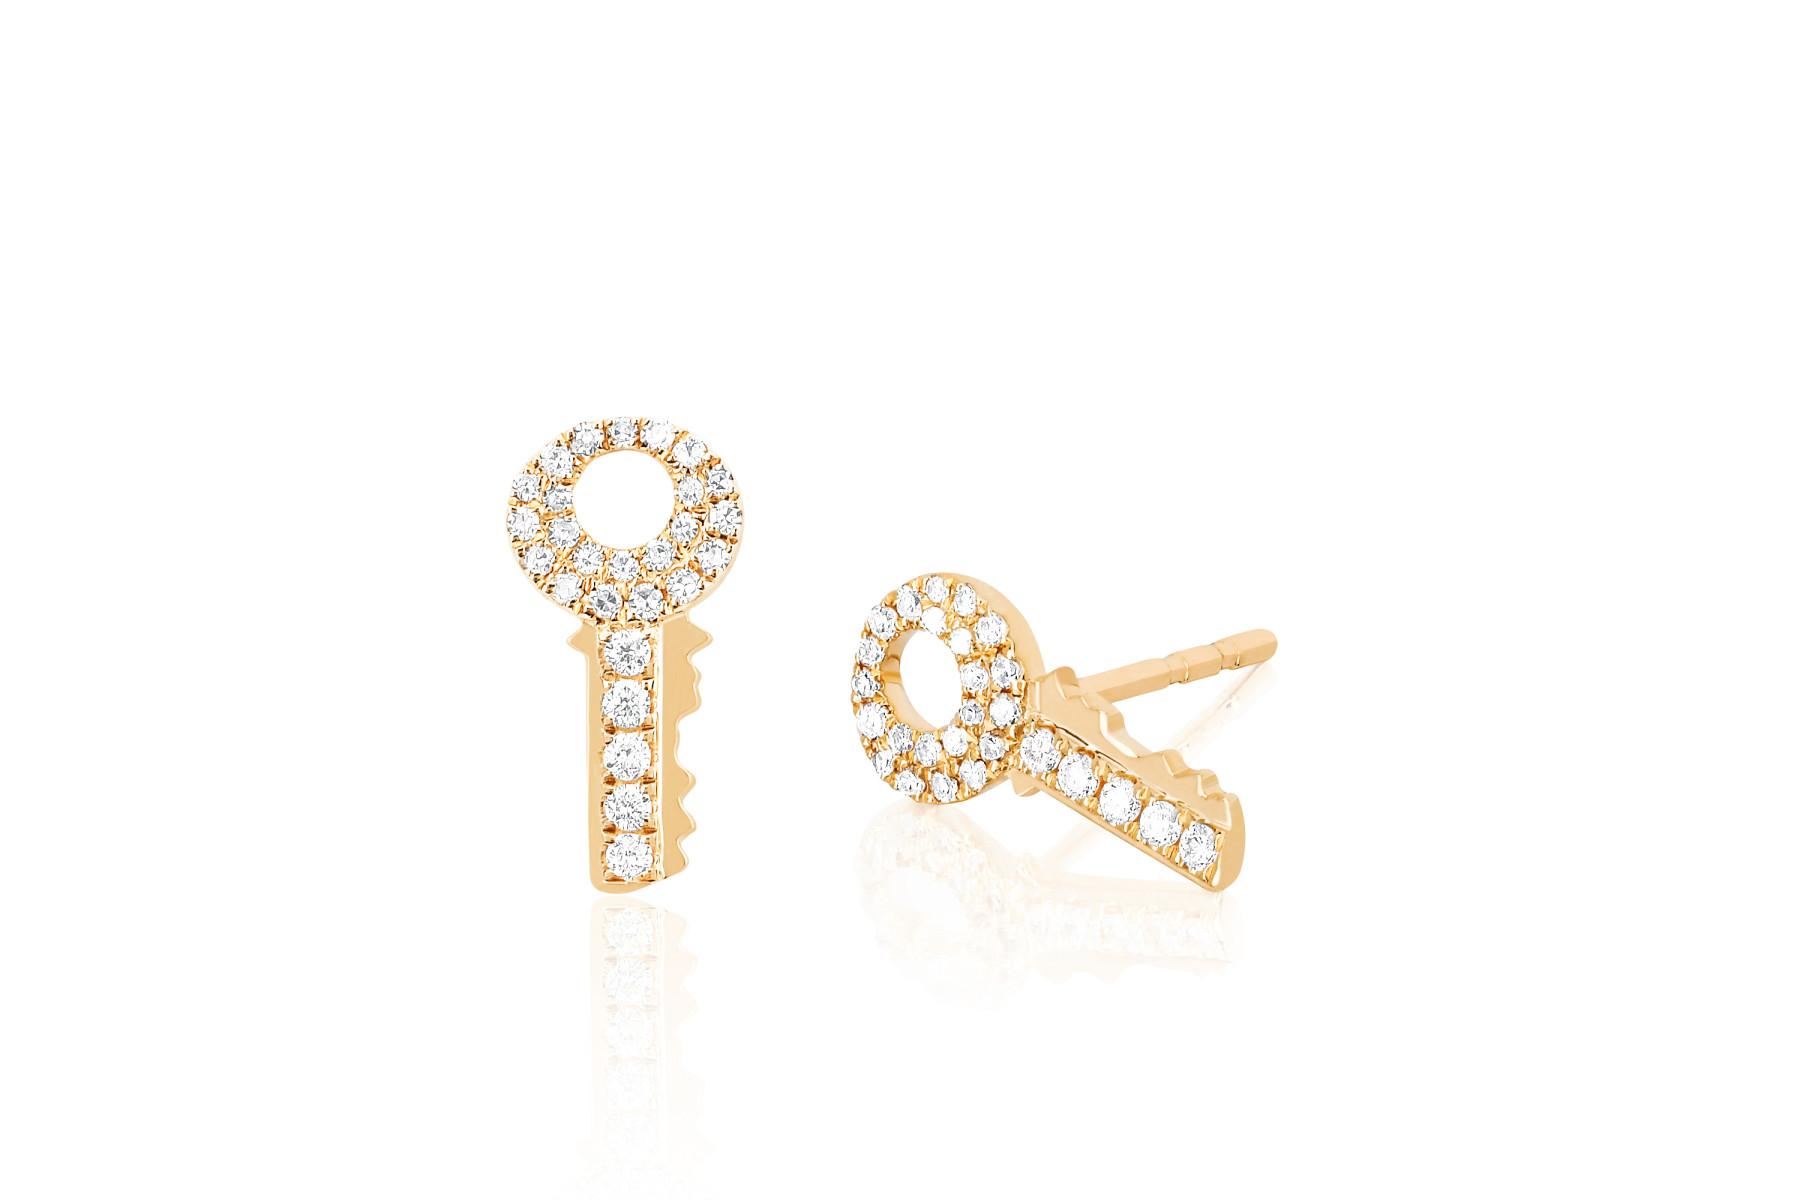 EF Collection Diamond Key Stud Earrings in 14K Yellow Gold